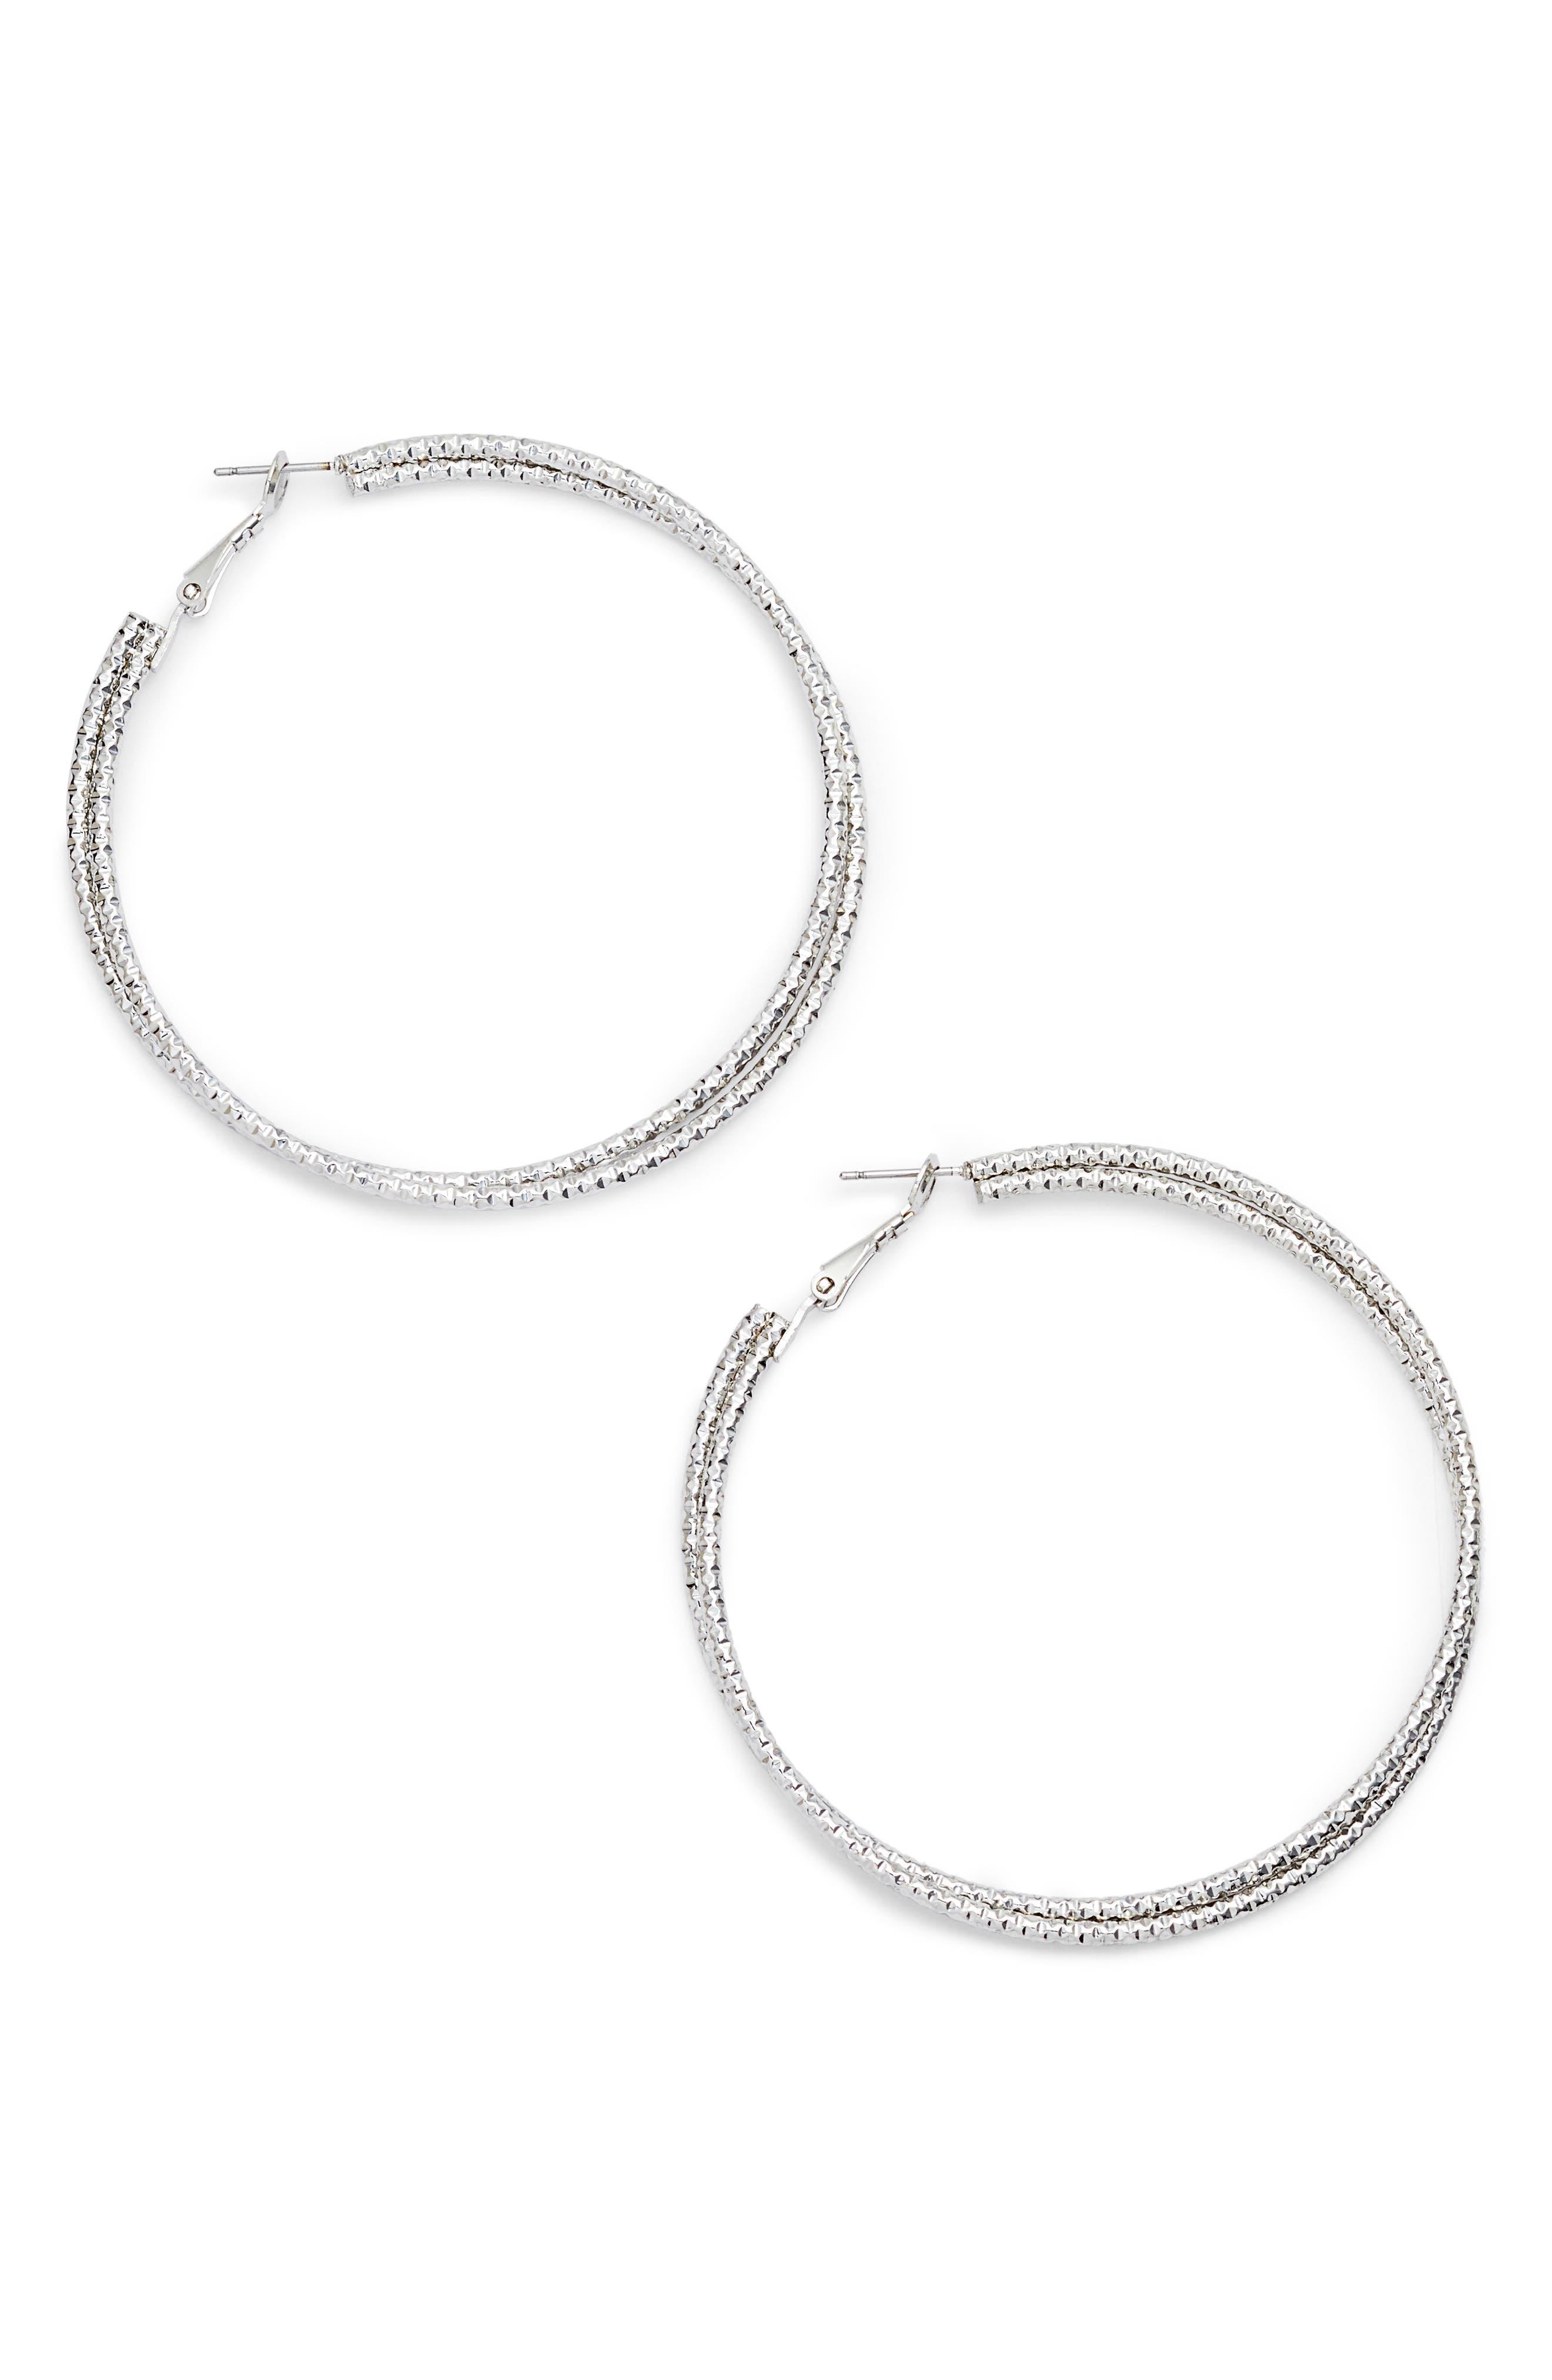 Textured Hoop Earrings,                             Main thumbnail 1, color,                             040